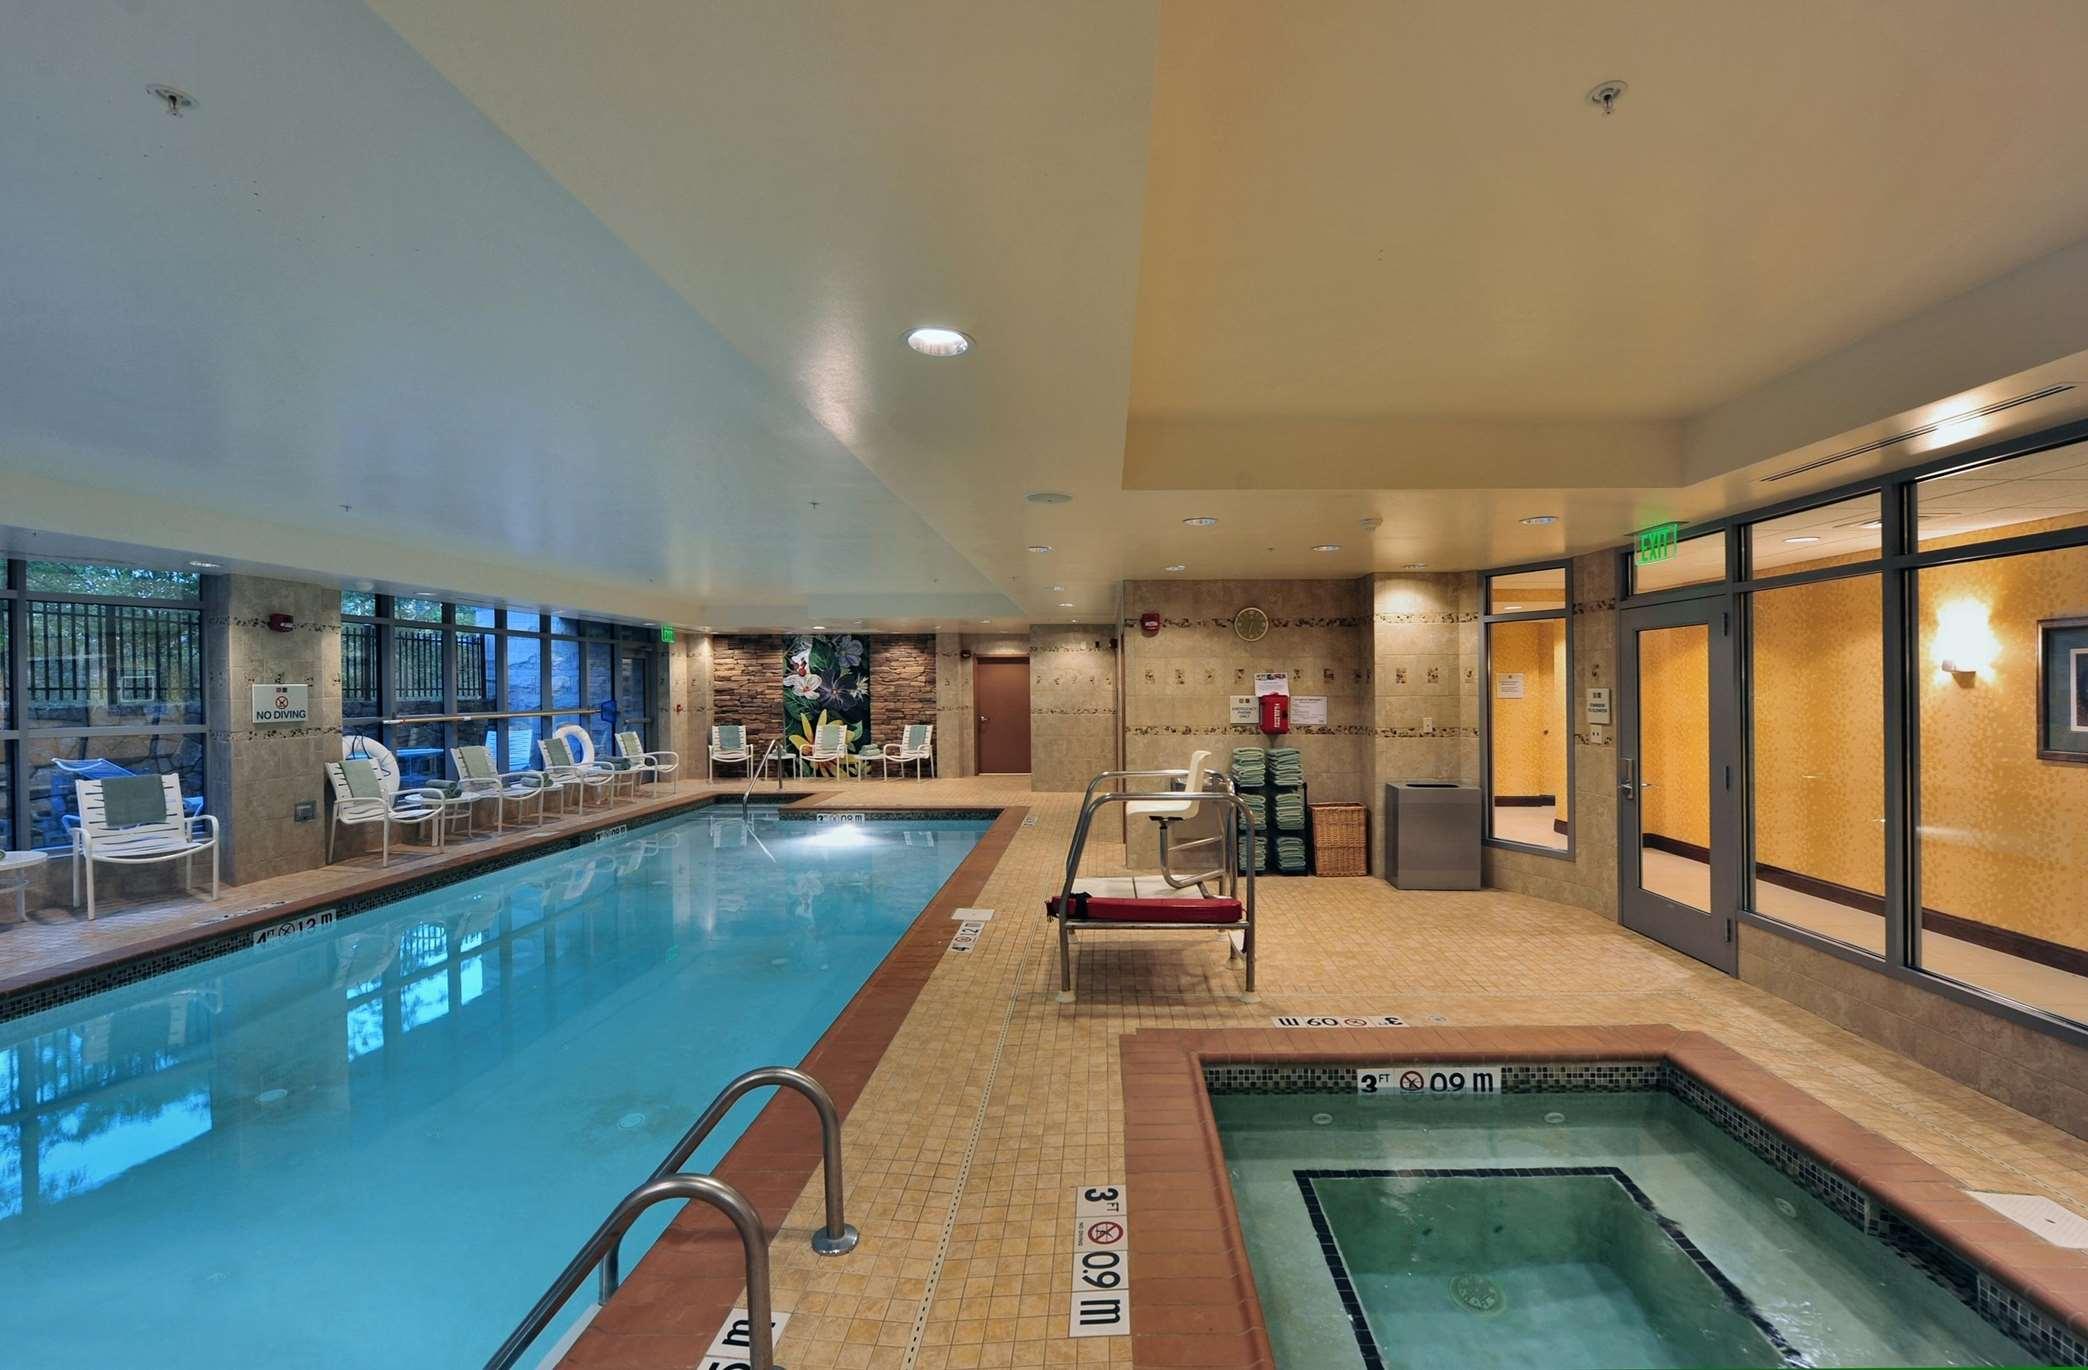 Hilton Garden Inn Rockville-Gaithersburg image 1